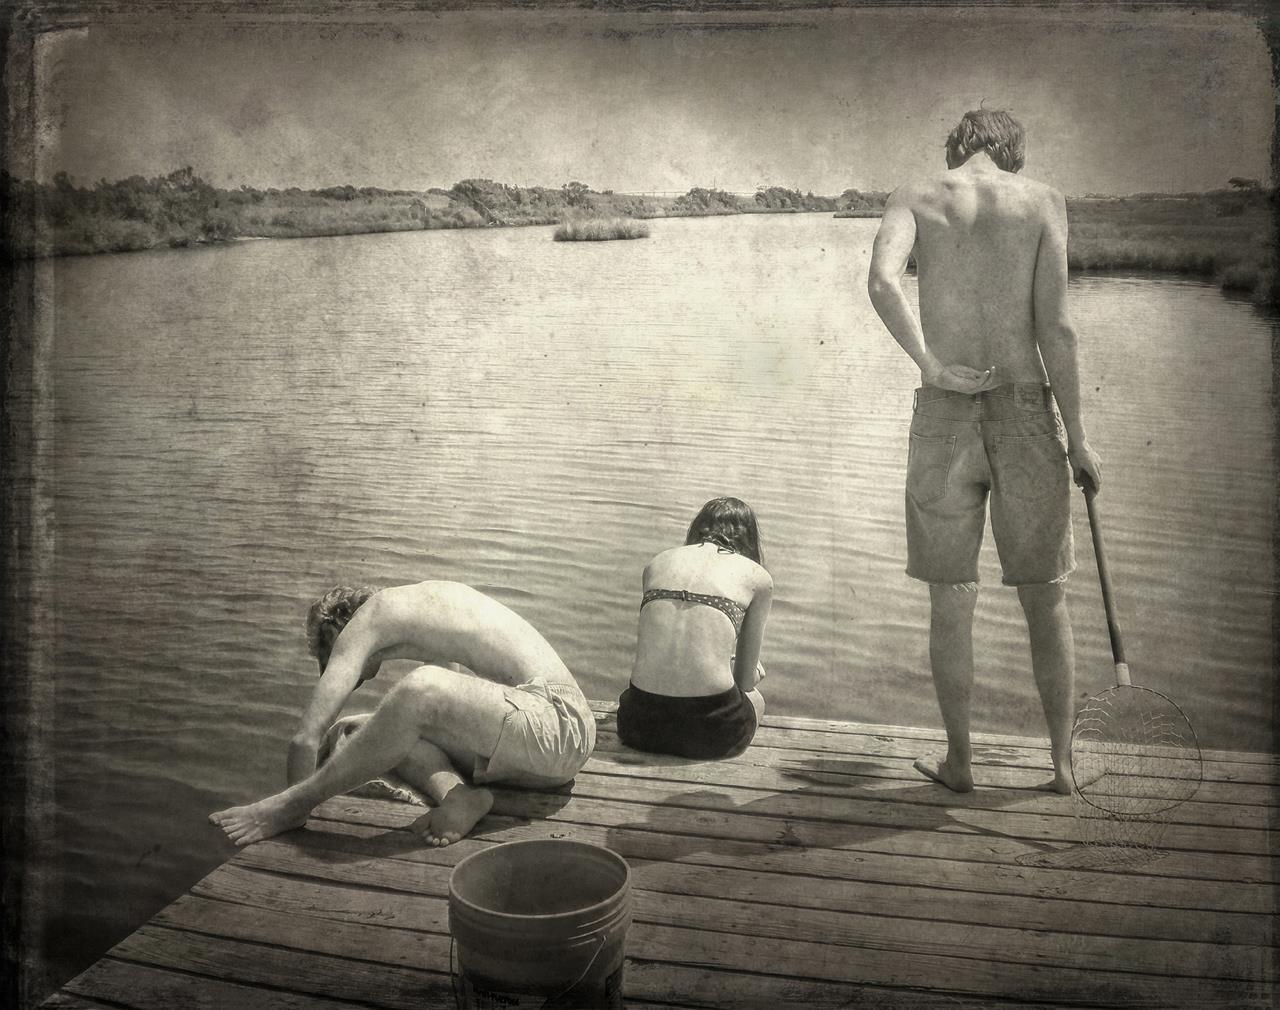 Поиск, Дейл Нилс / Dale Niles, Фейетвилл, Джорджия, Фотоконкурс Santa Fe Photographic